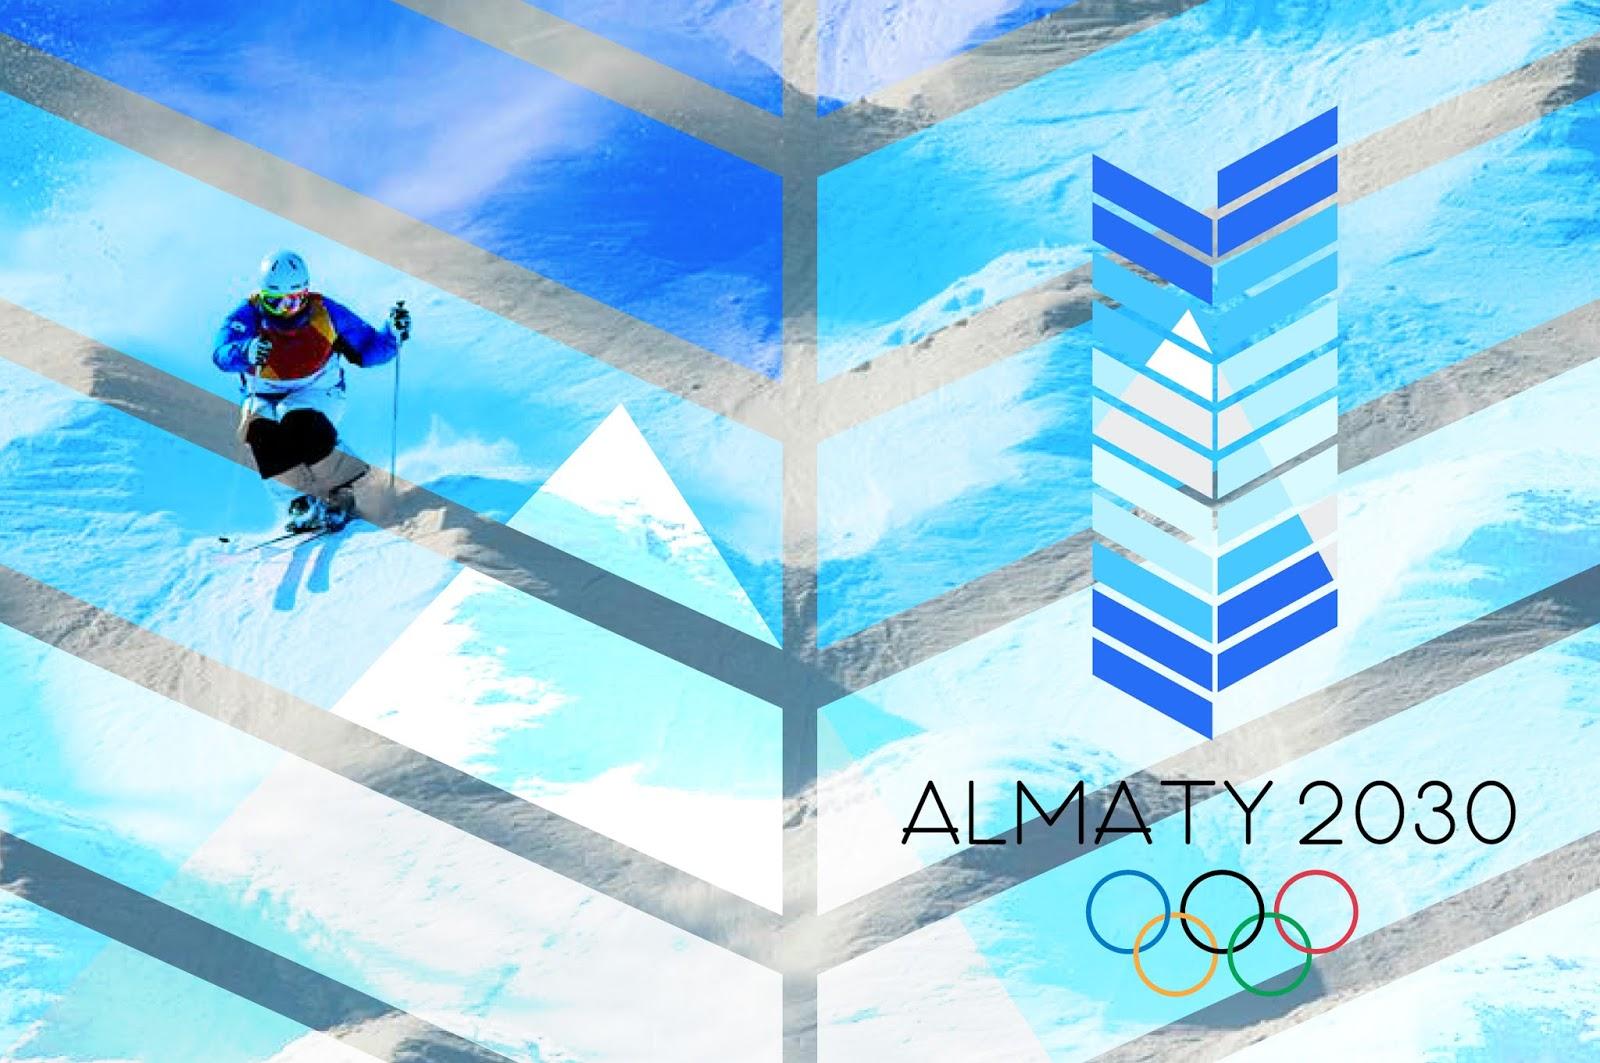 almaty-poster-1.jpg